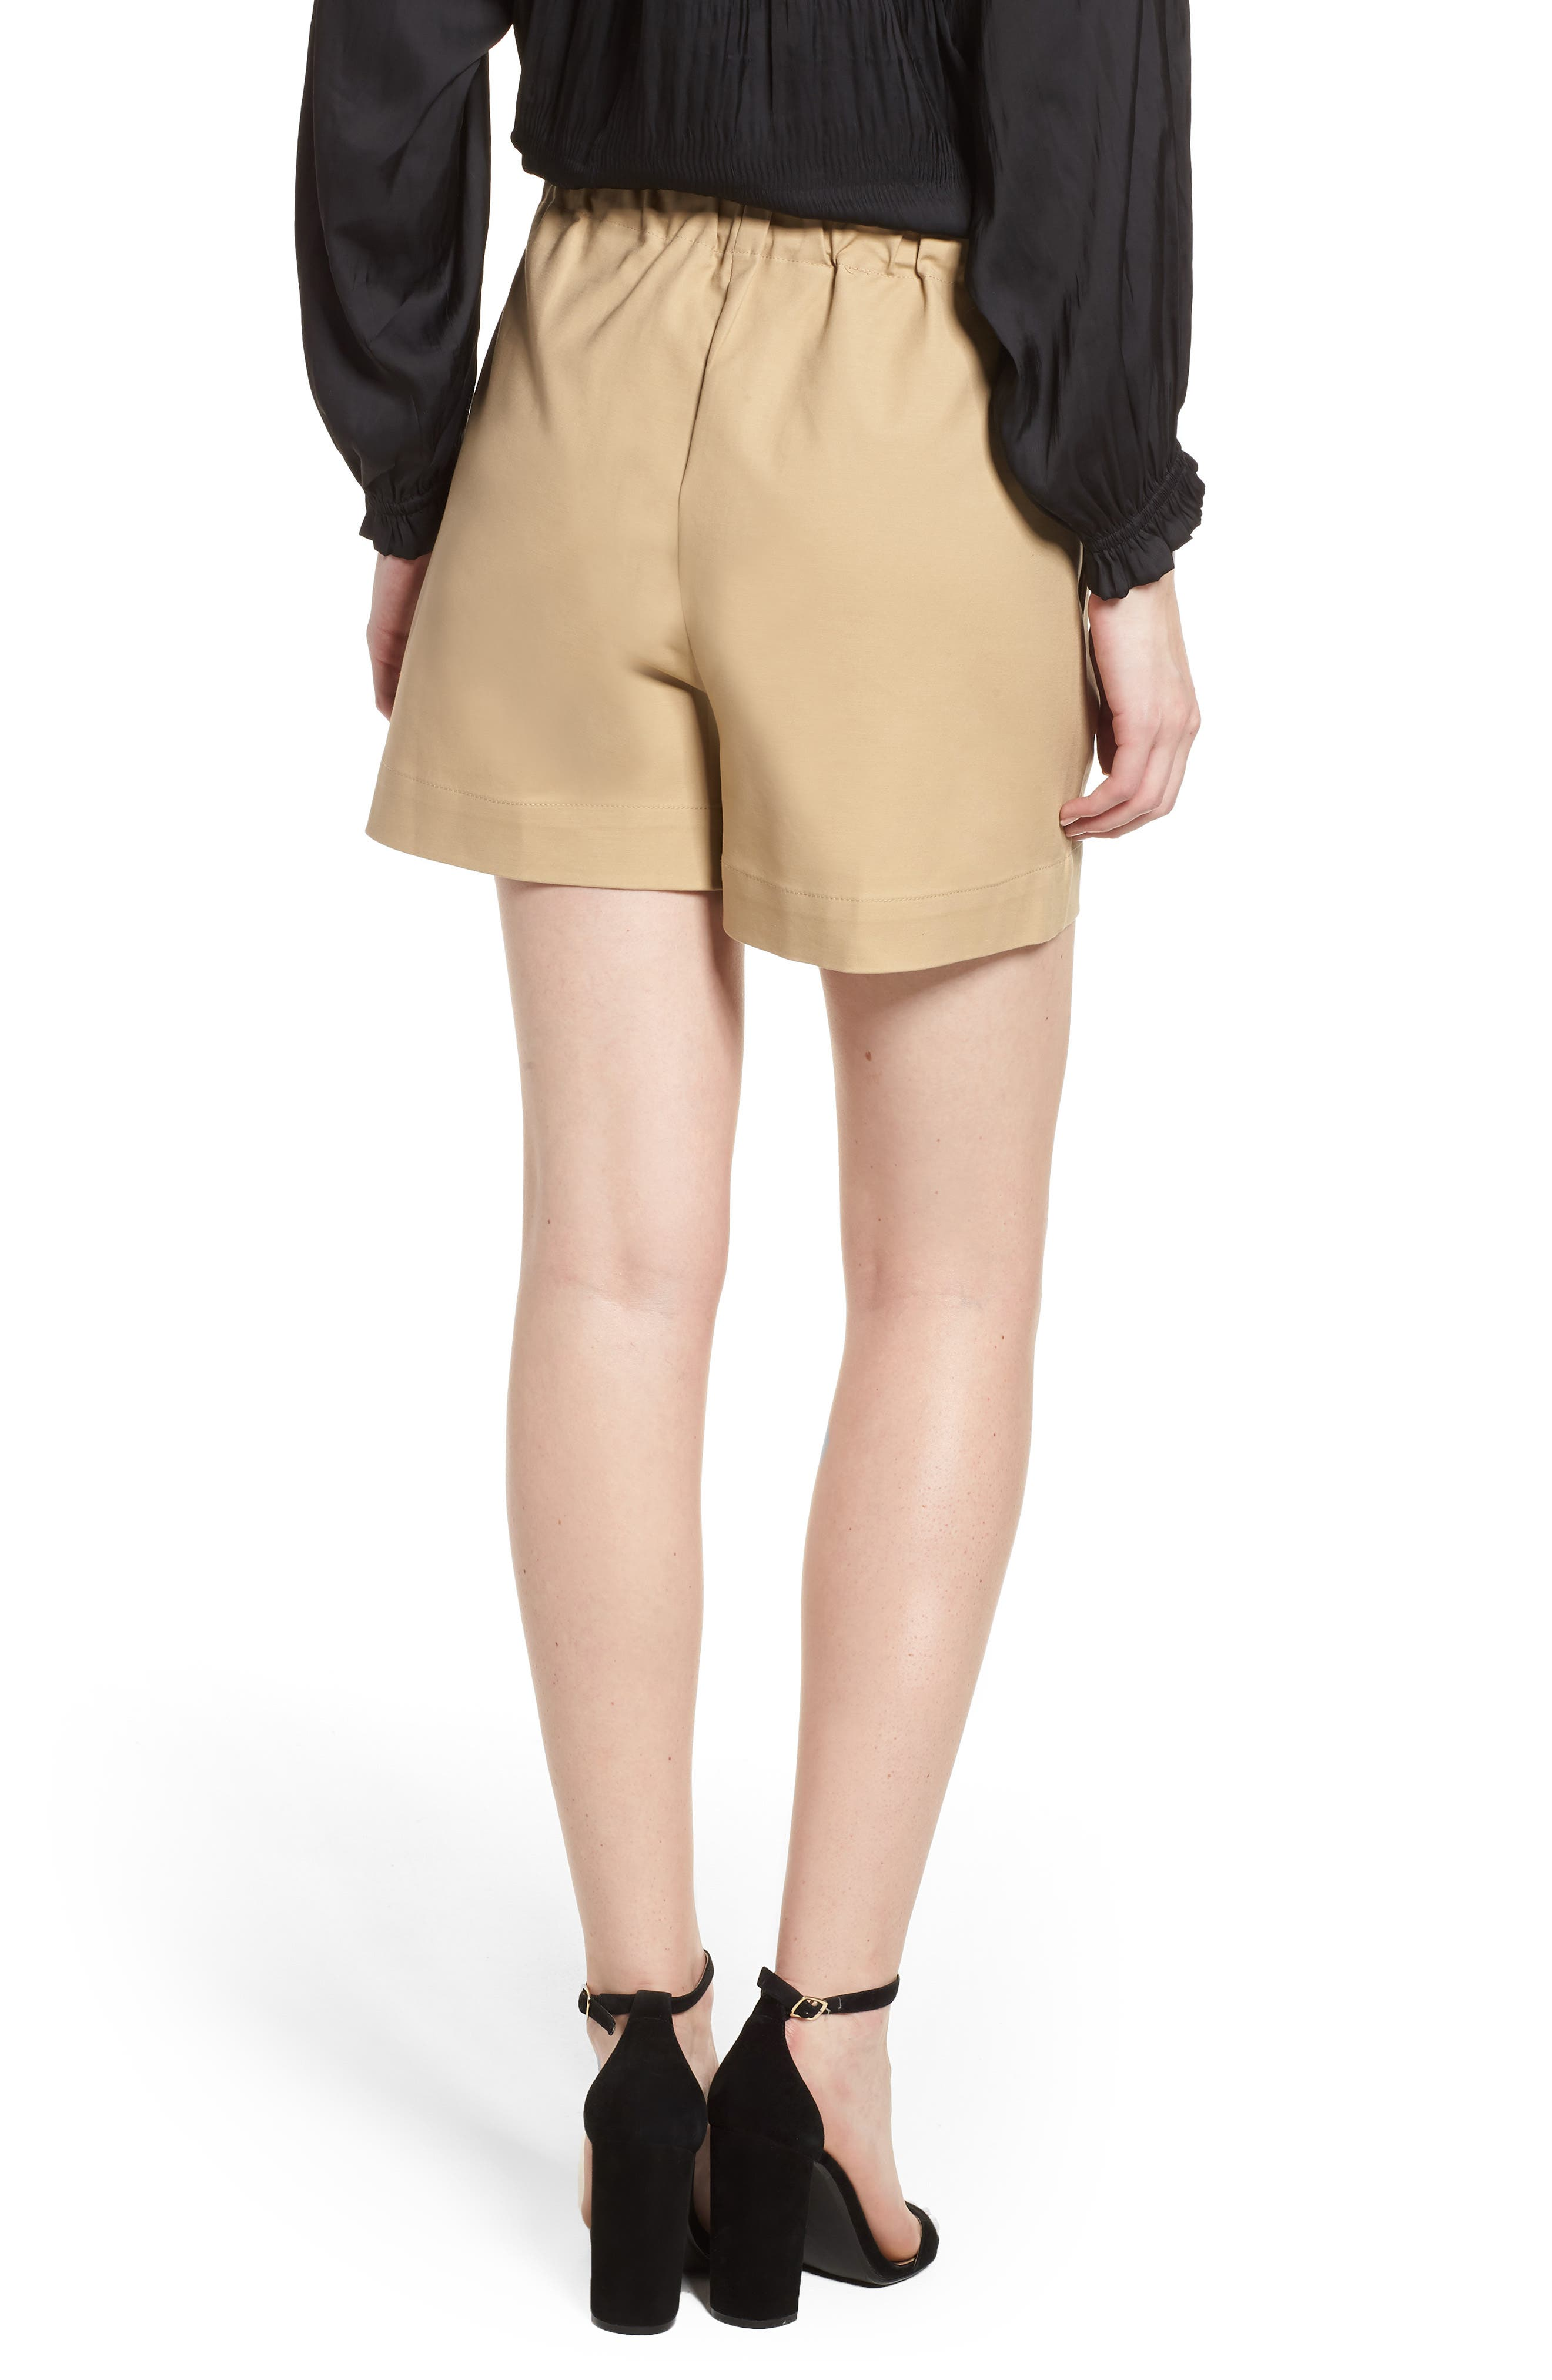 Park South Shorts,                             Alternate thumbnail 2, color,                             250